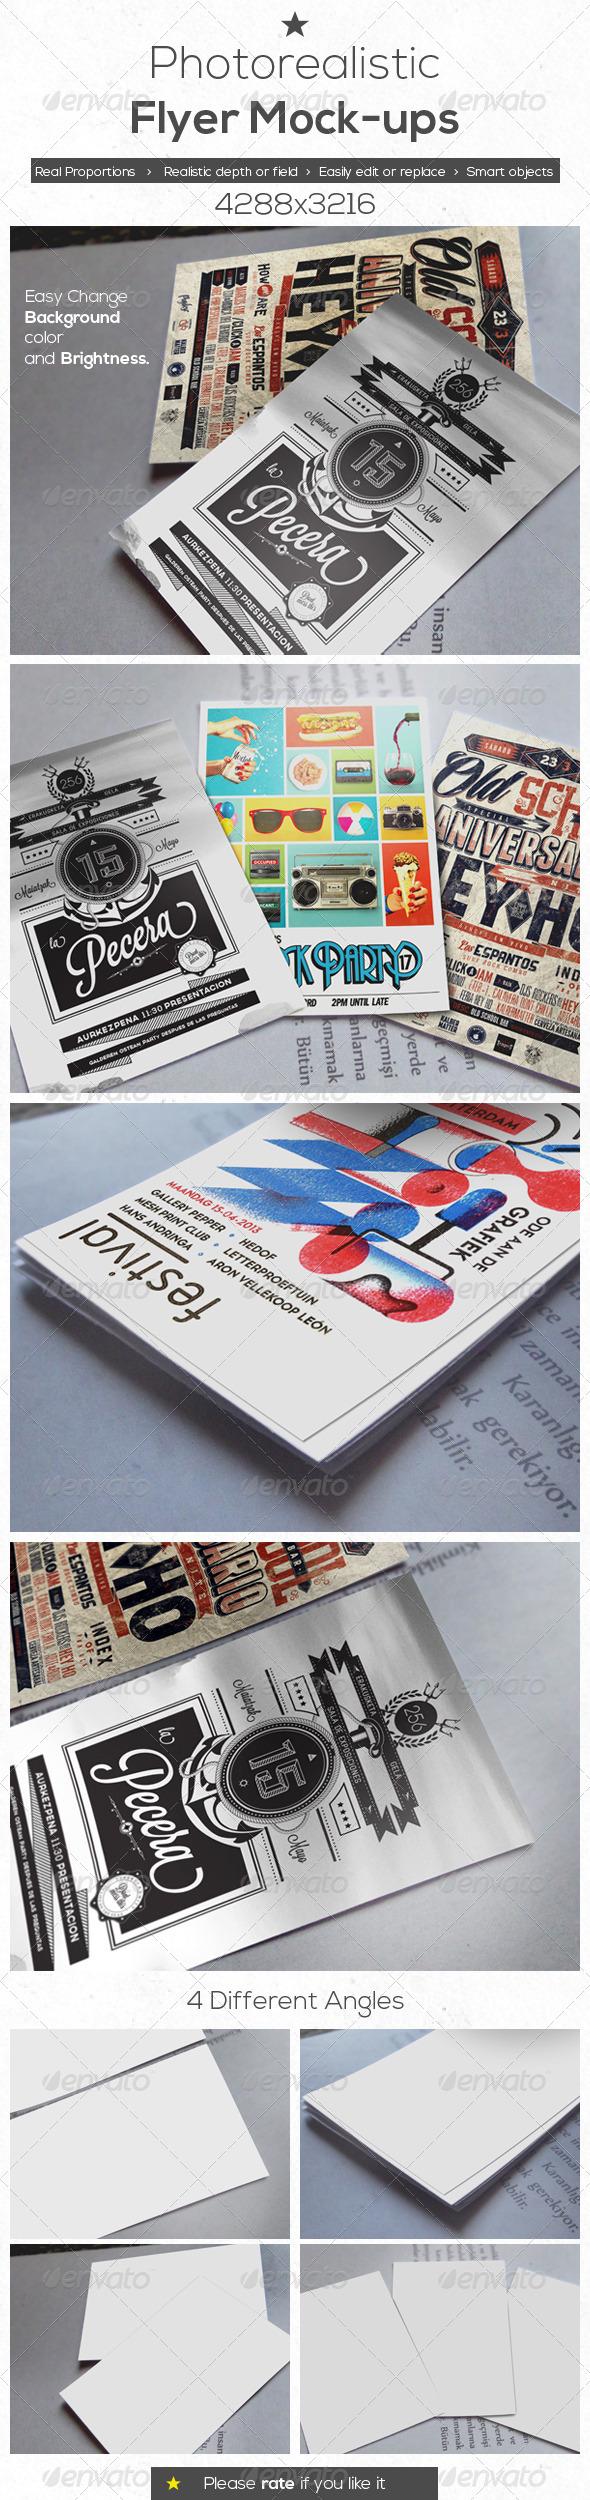 Photo Realistic Flyer Mock-Ups - Flyers Print